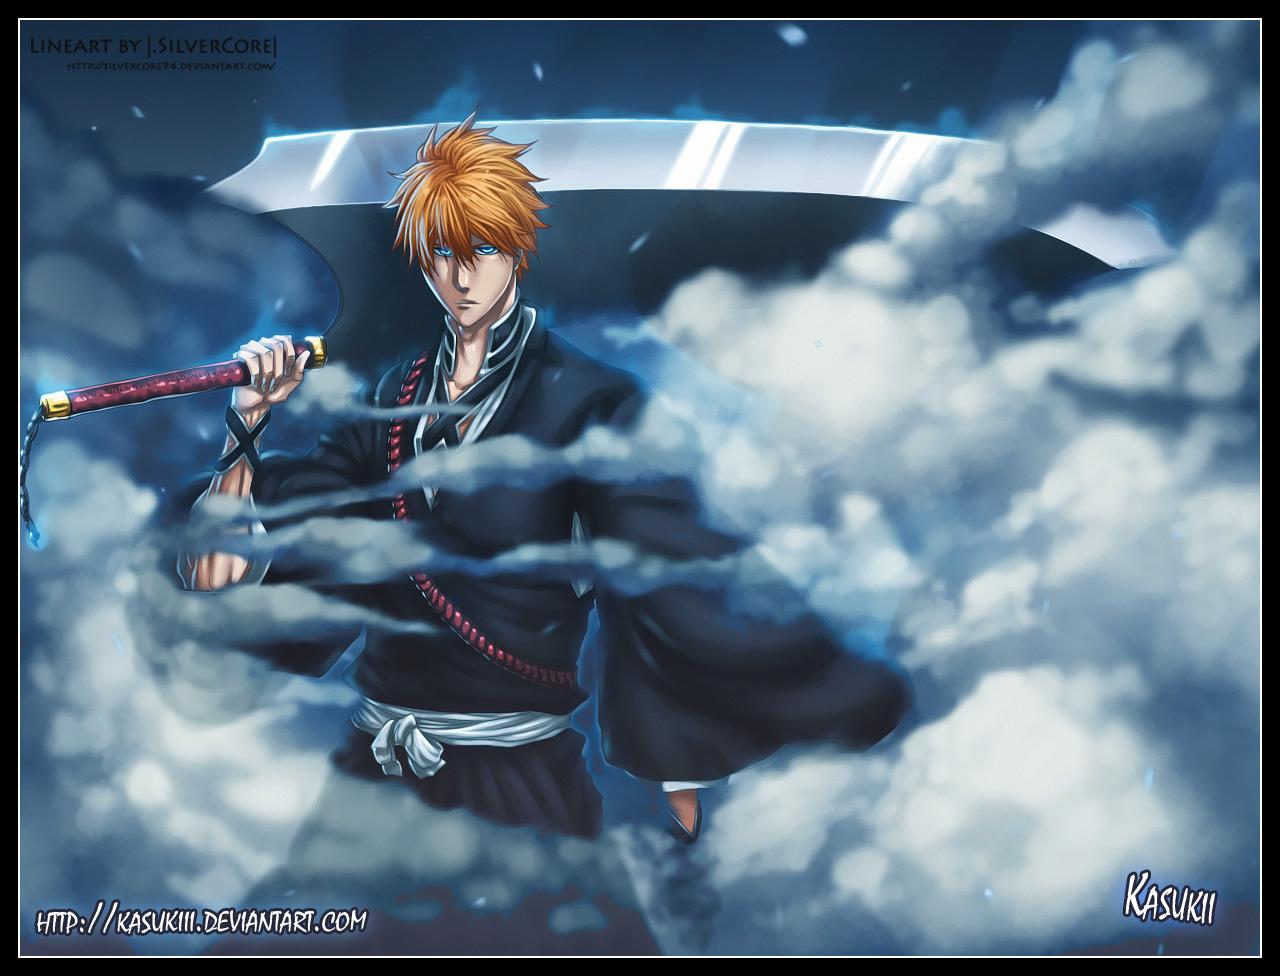 Ichigo Kurosaki New Look And Sword